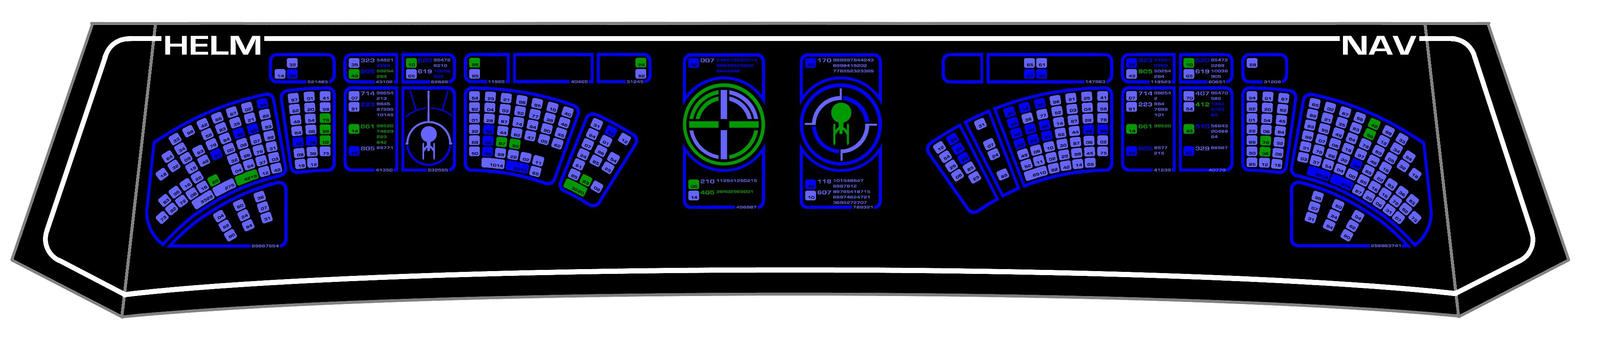 Helm nav console 1701 a by keiichi k1 on deviantart - Star trek online console ...